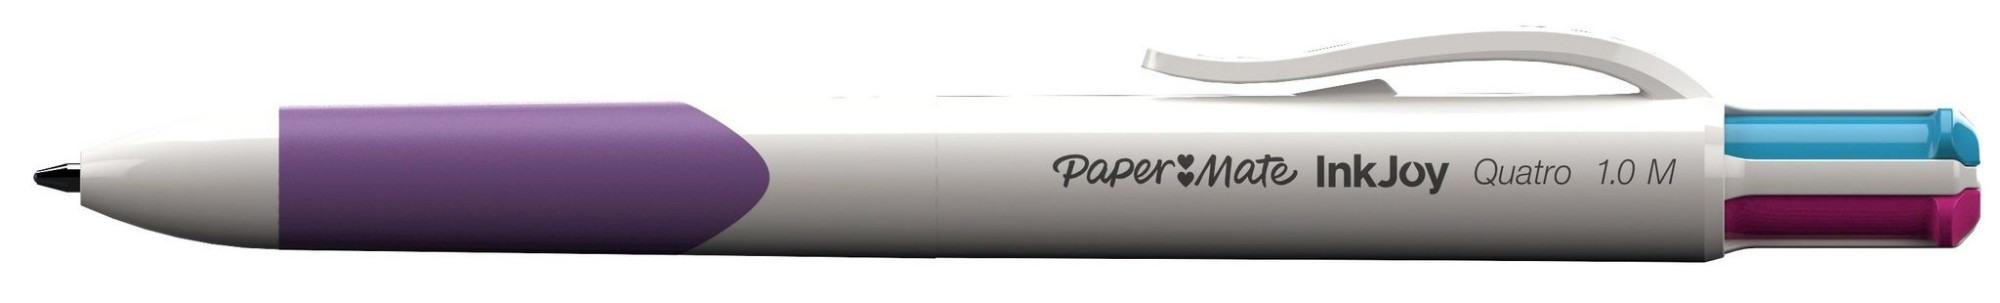 Papermate Inkjoy Quatro Clip-on retractable ballpoint pen Medium Blue,Green,Purple,Red 12pc(s)